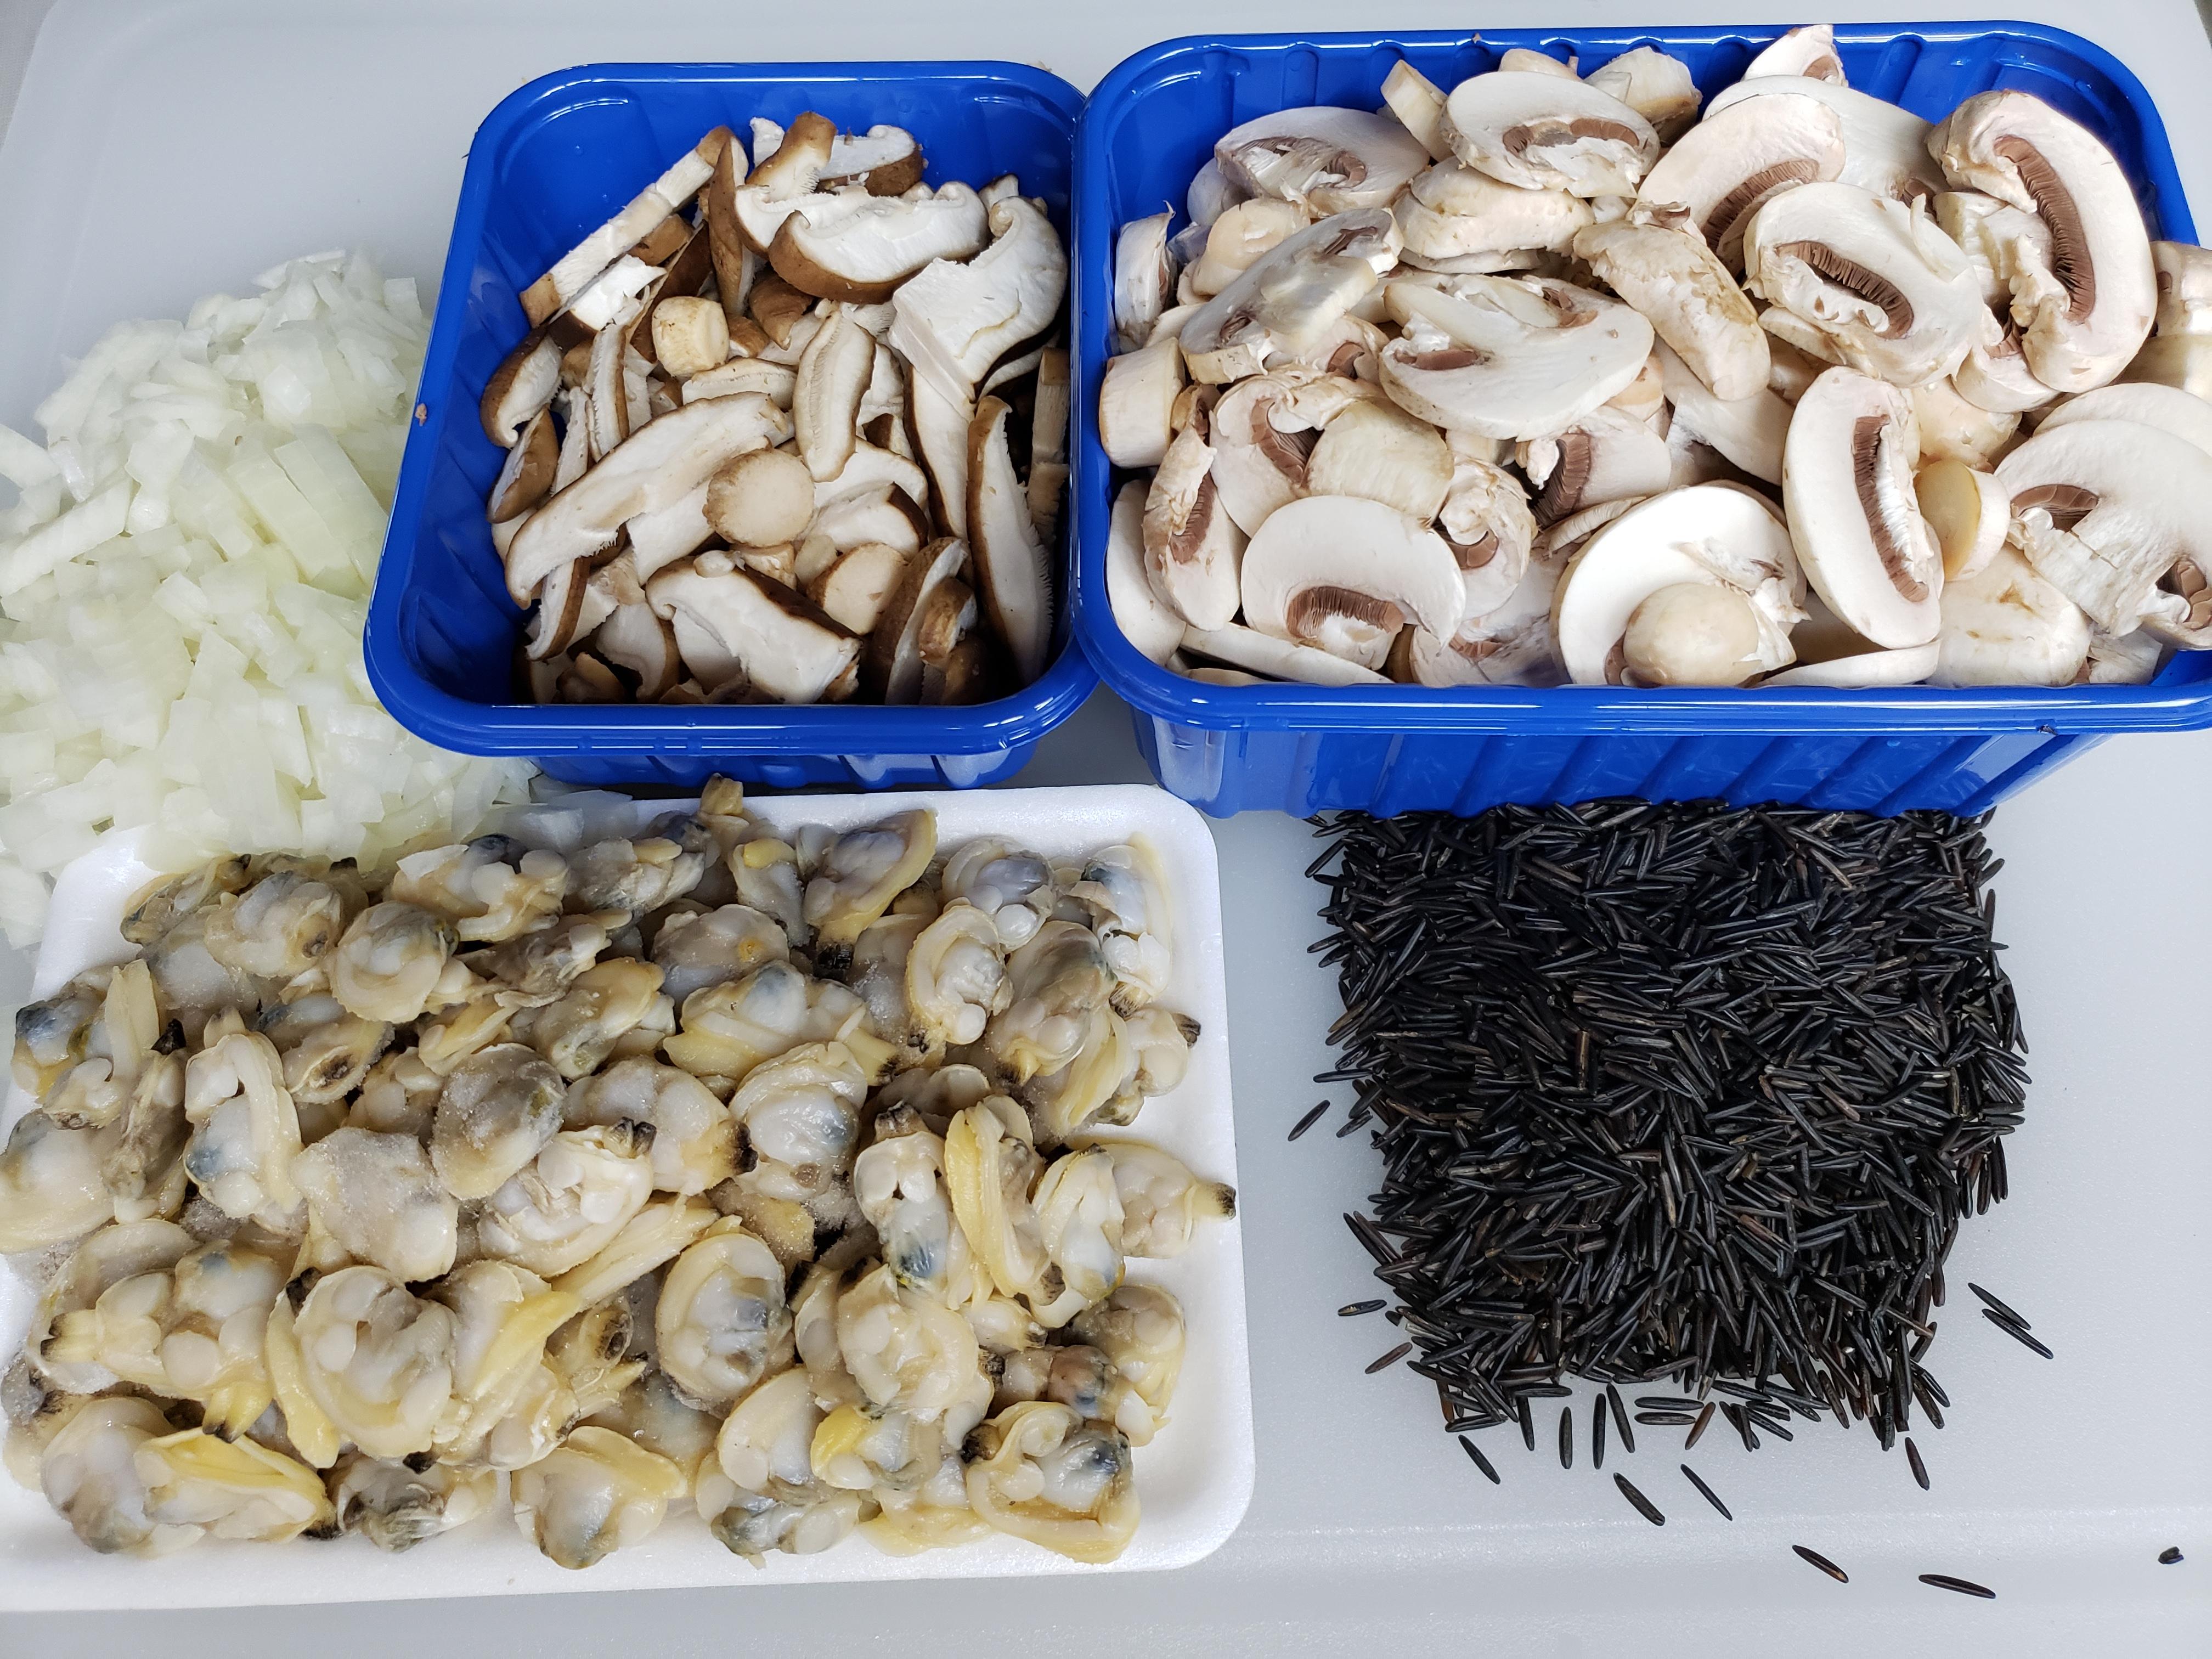 Seafood Cream of Mushroom Soup with Wild Rice